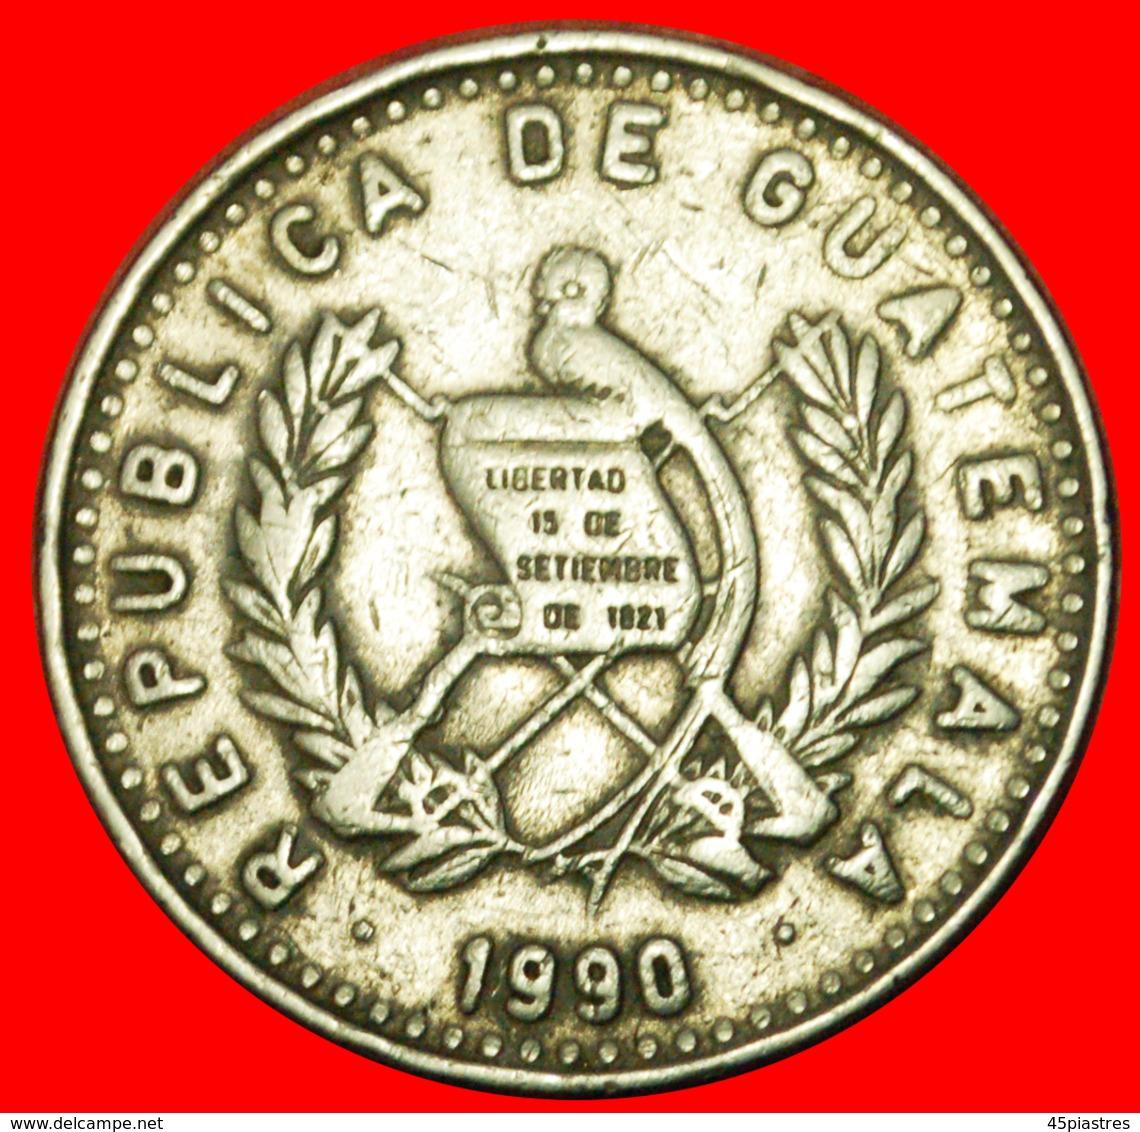 # BIRD (1977-2000): GUATEMALA ★ 25 CENTAVOS 1990! LOW START ★ NO RESERVE! - Guatemala